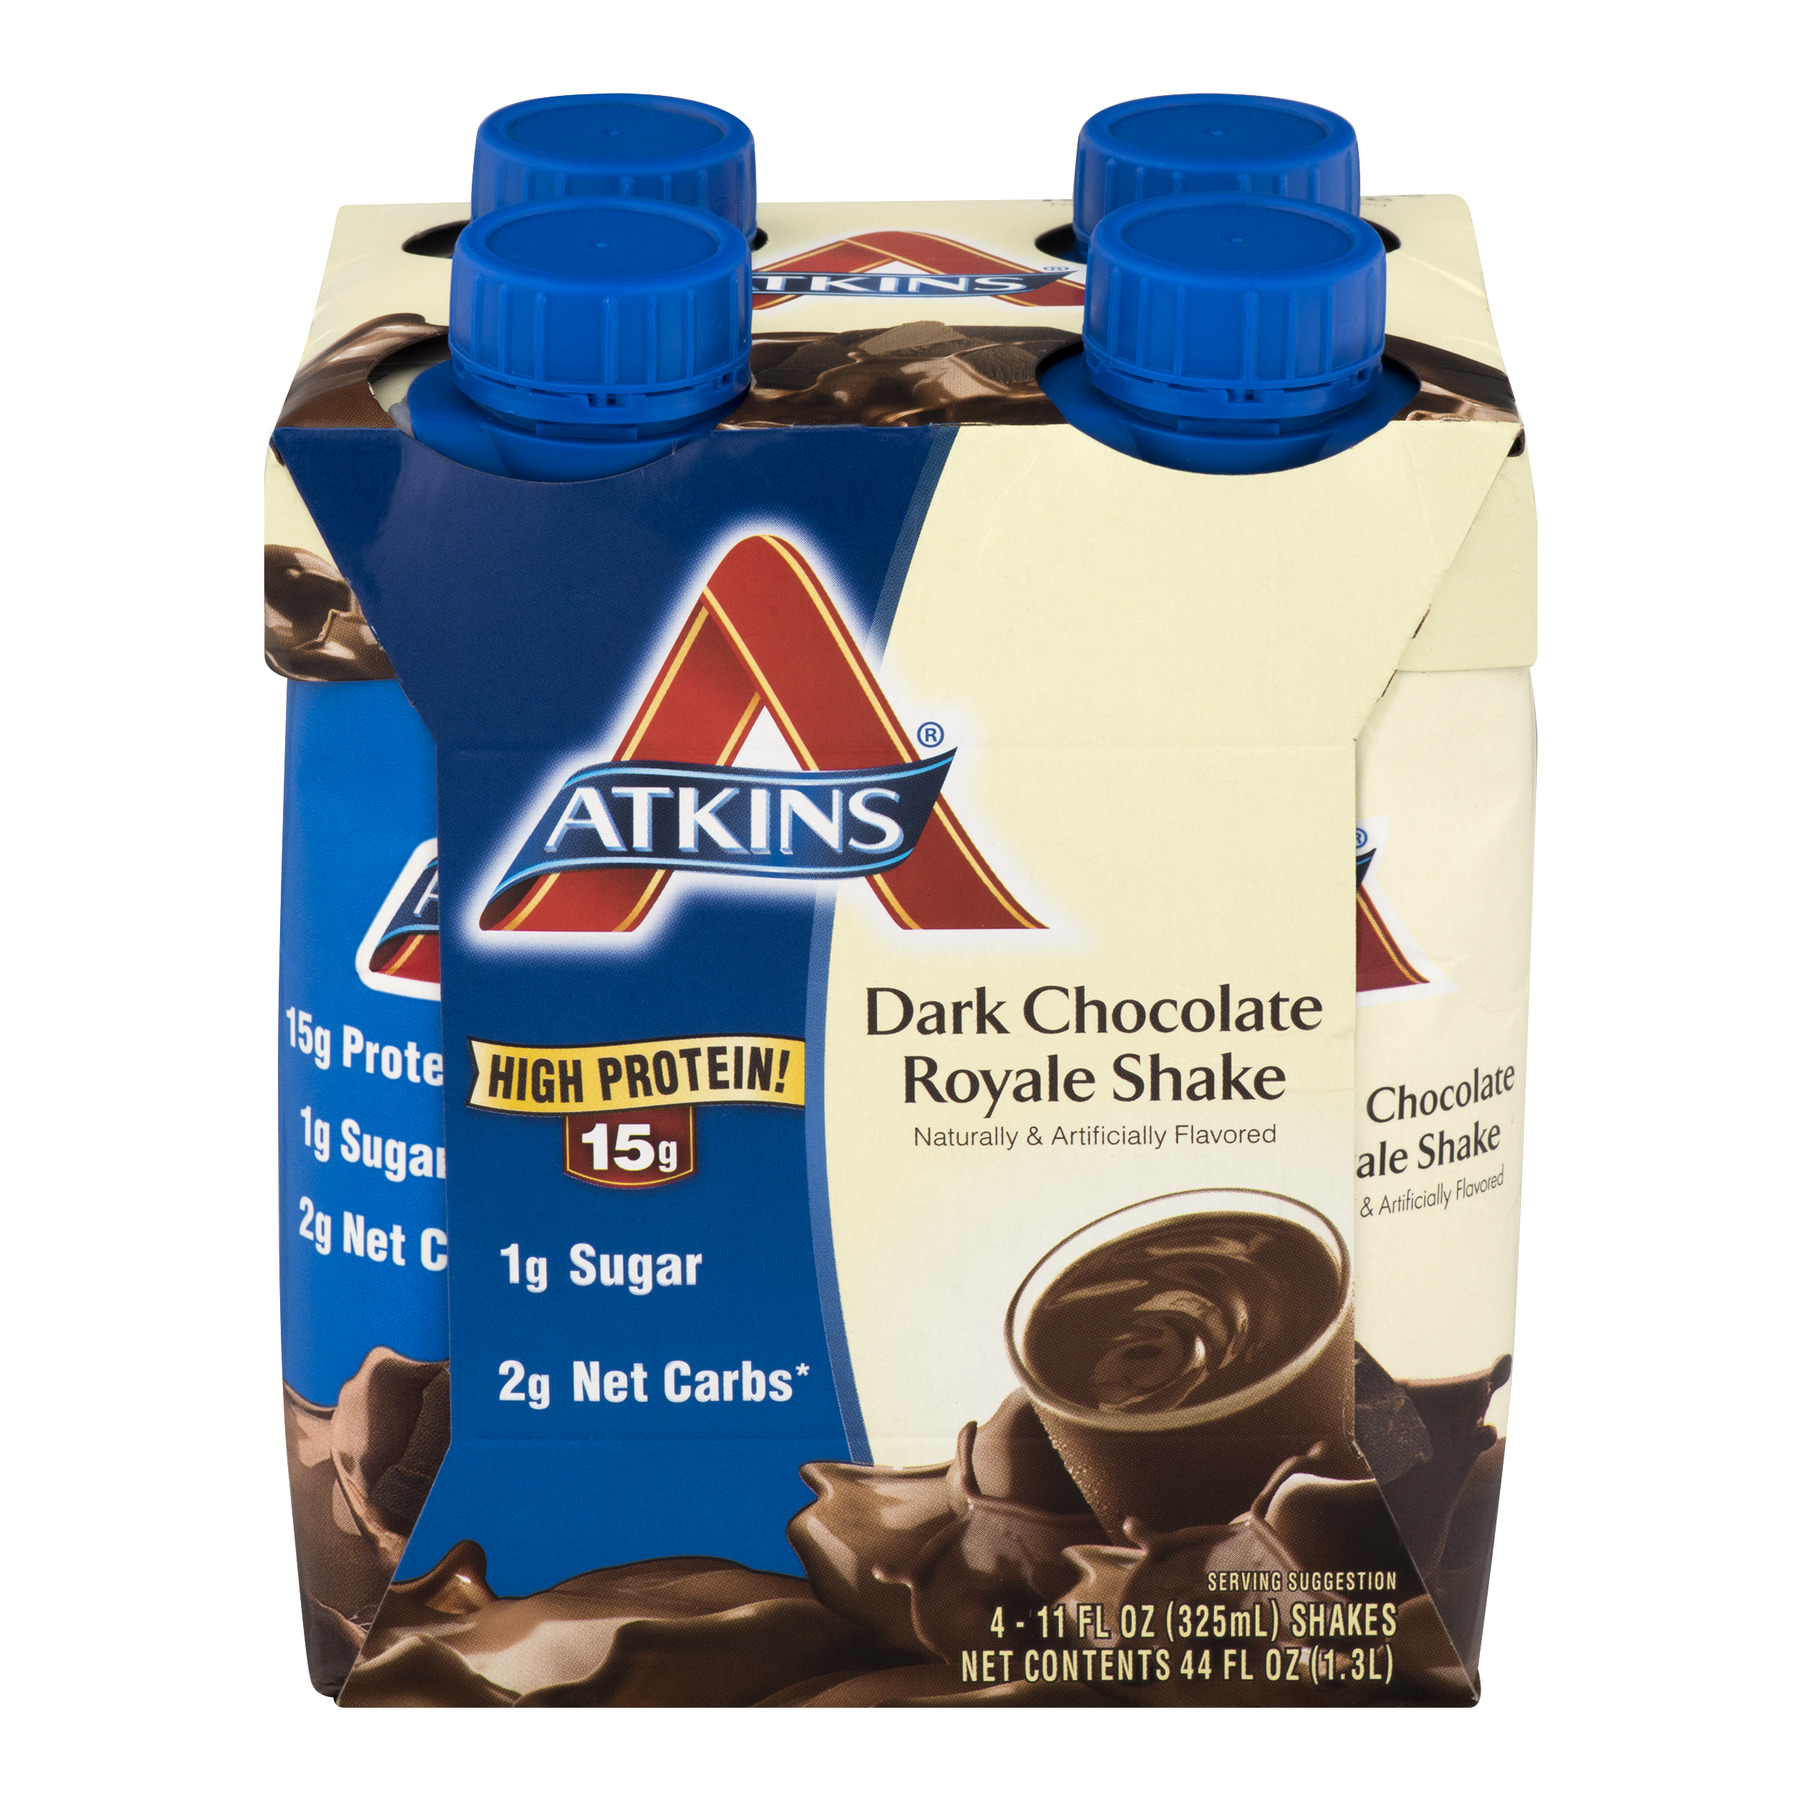 Atkins Dark Chocolate Royale Shake, 11Fl oz., 4-pack (Ready To Drink)